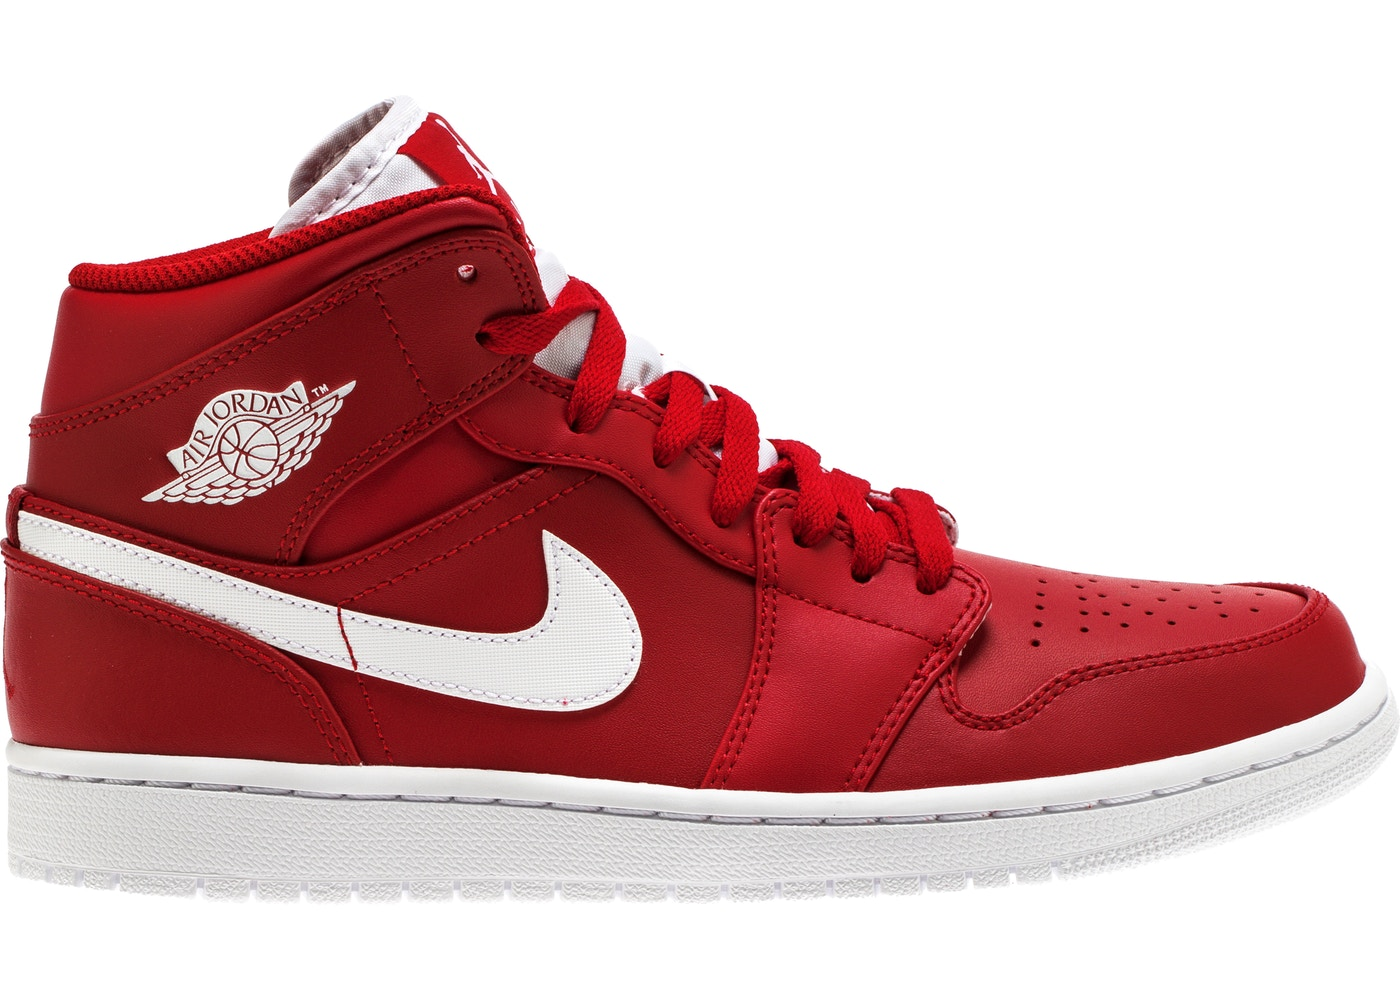 sports shoes 9efd0 21039 Jordan 1 Retro Mid Gym Red White